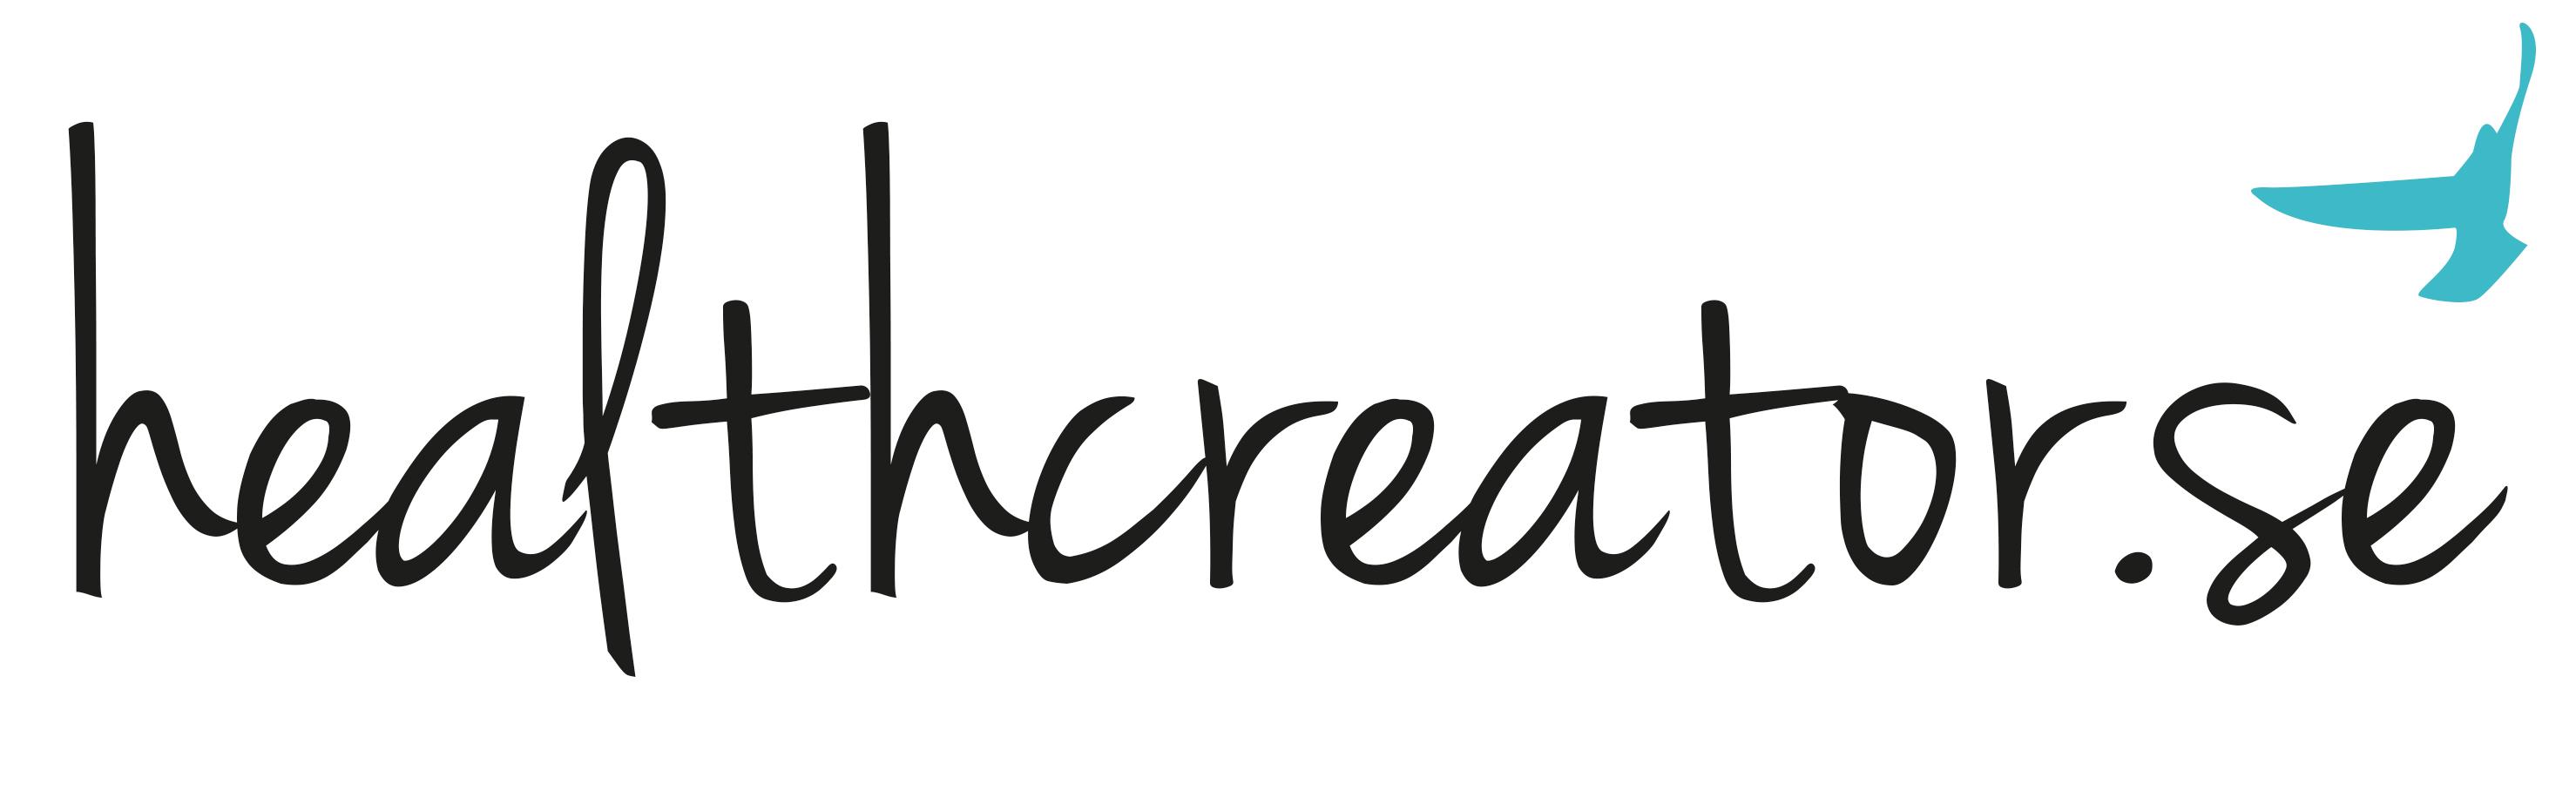 healthcreator logotyp 2018